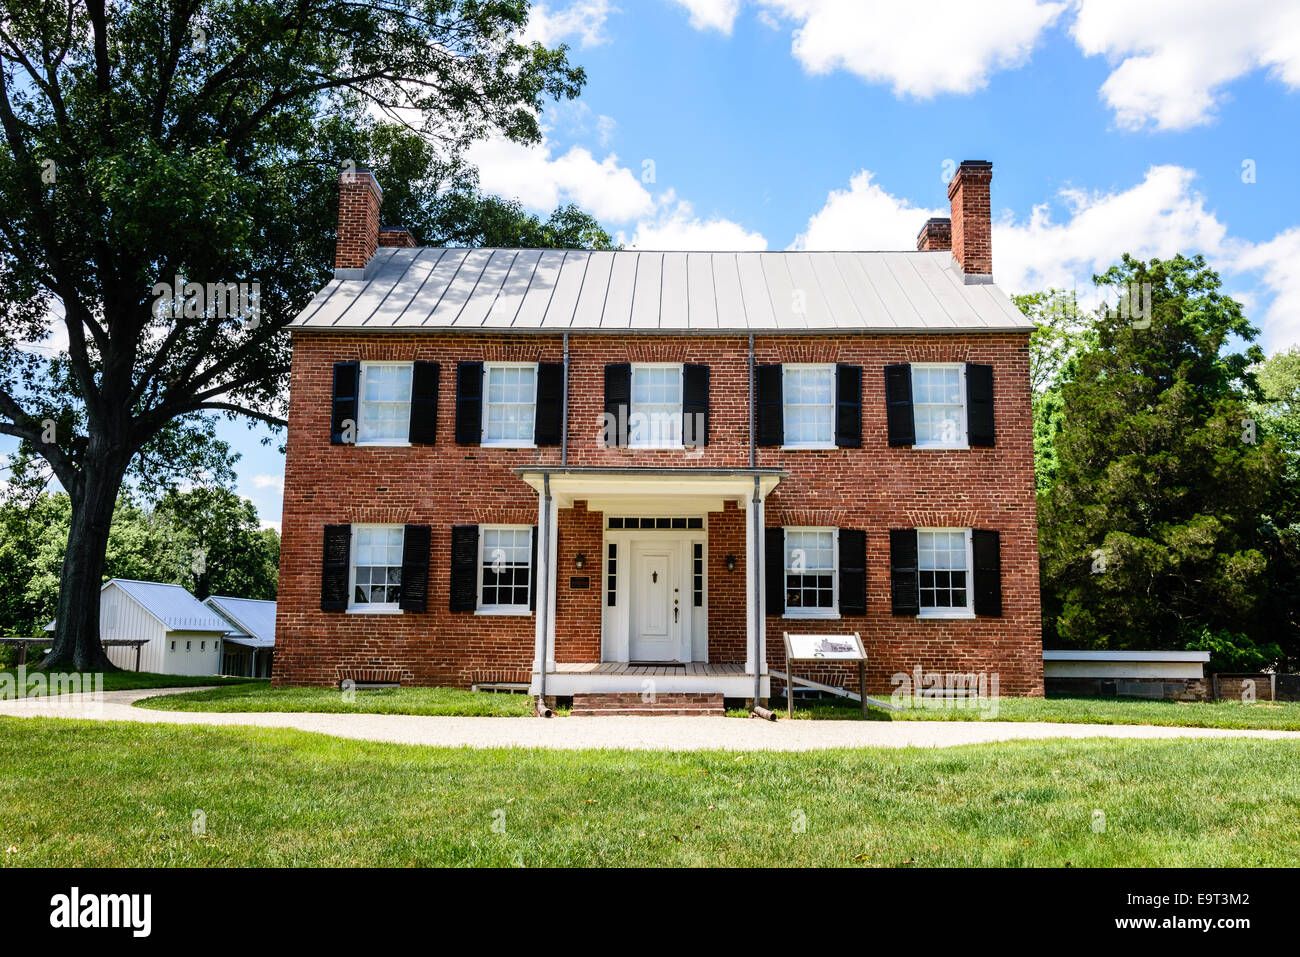 Historic Blenheim 3610 Old Lee Highway Fairfax City